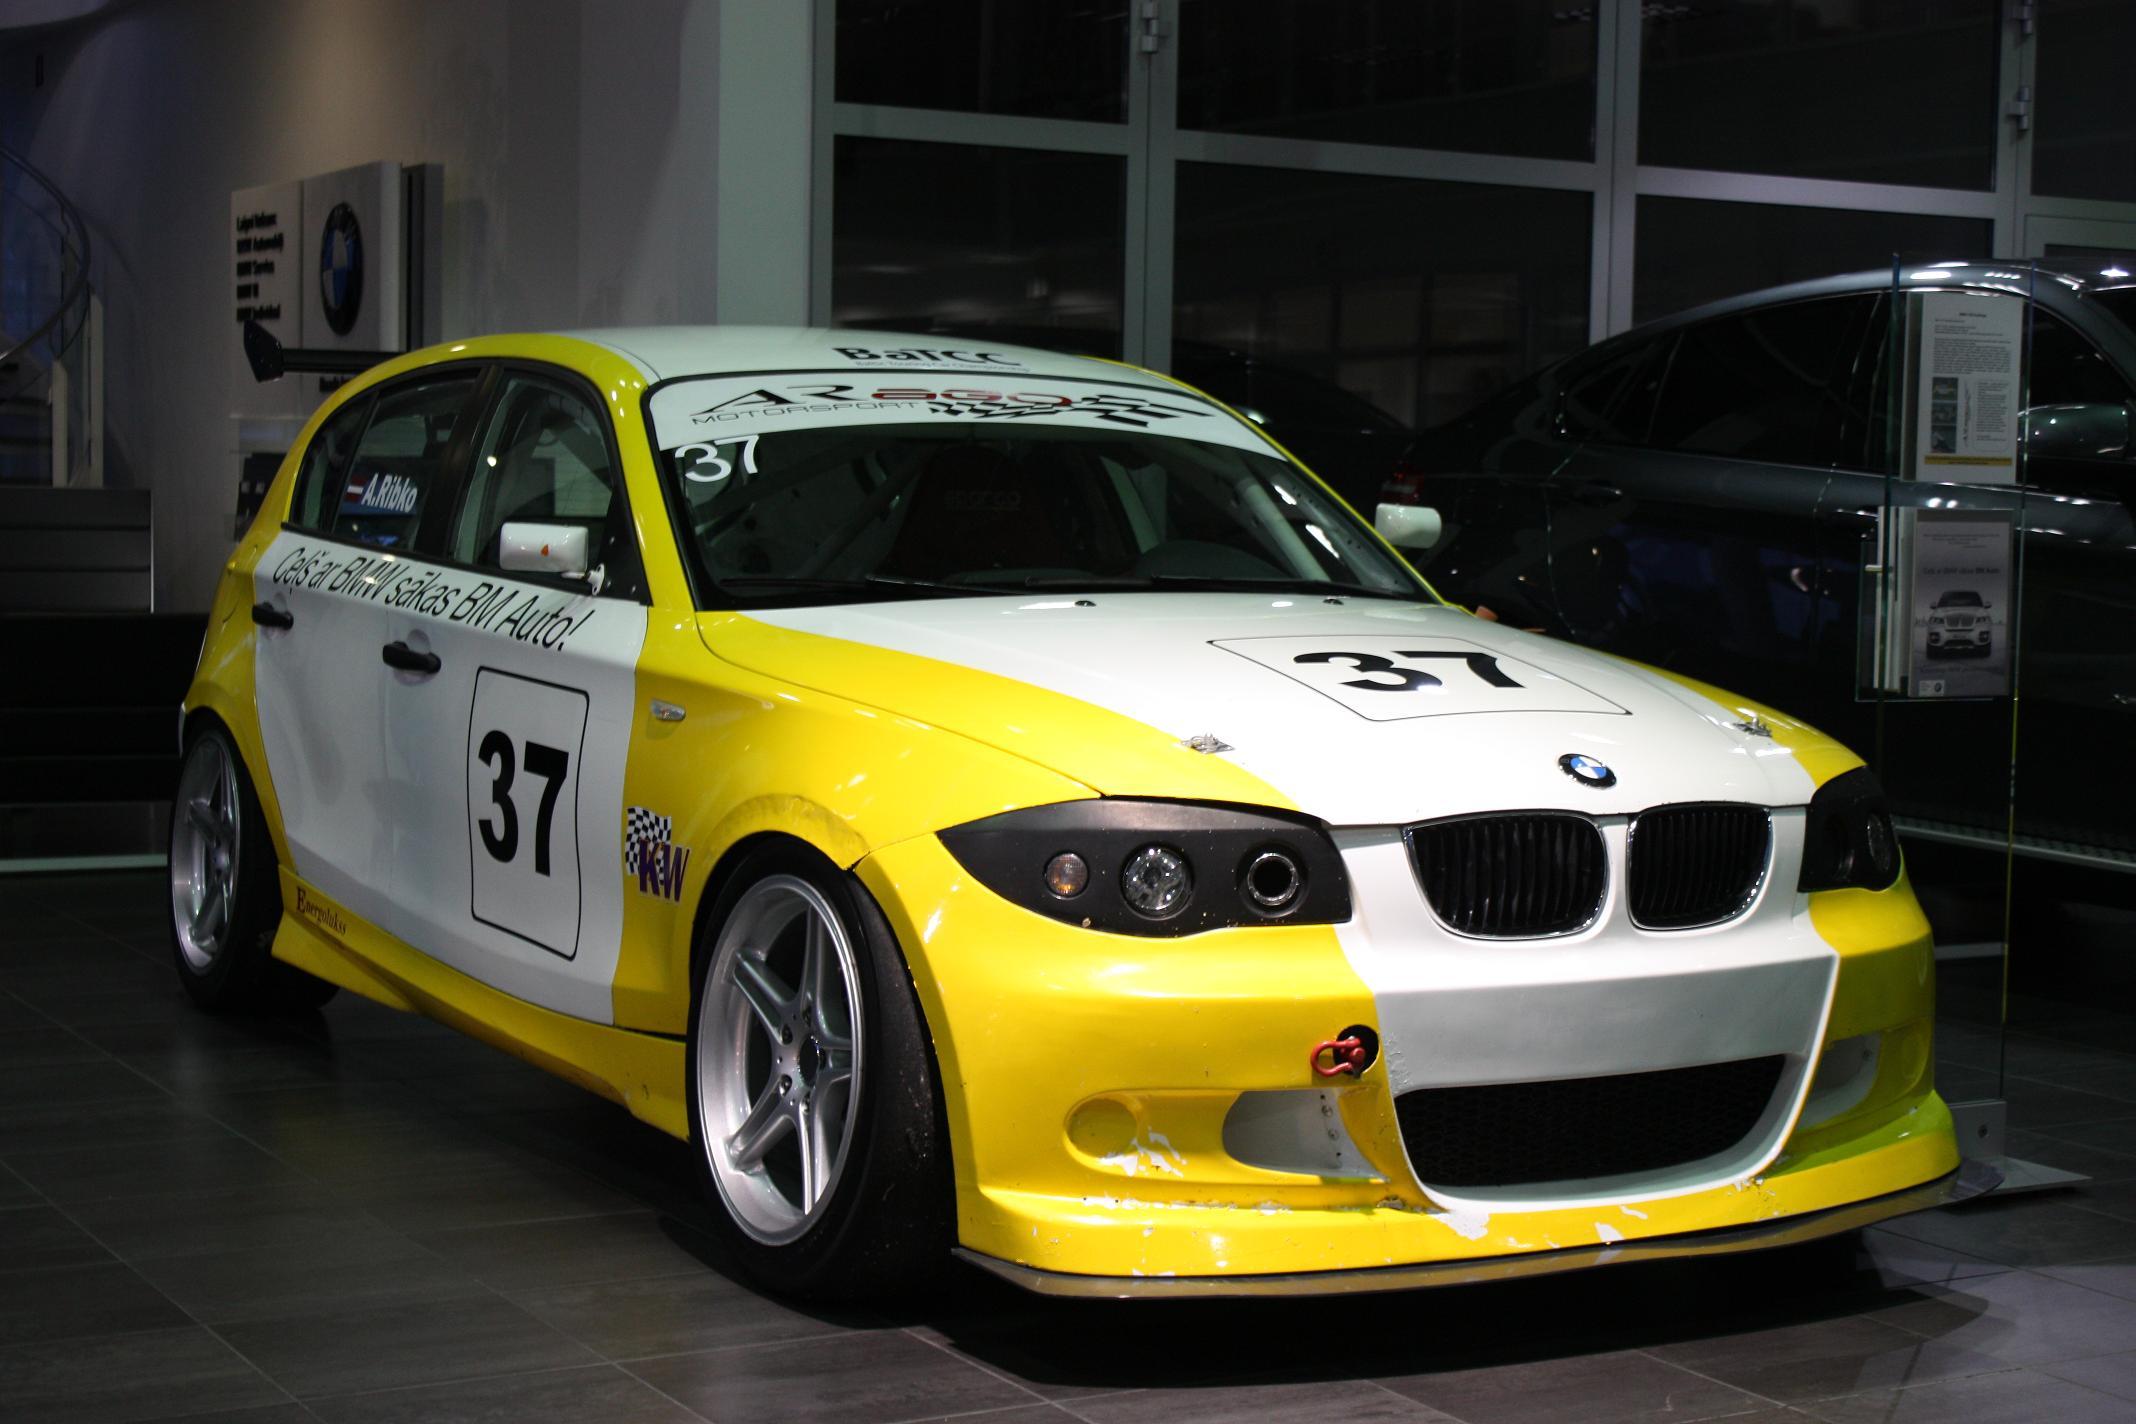 bmw 130i challenge race cars for sale at raced rallied rally cars for sale race cars for sale. Black Bedroom Furniture Sets. Home Design Ideas